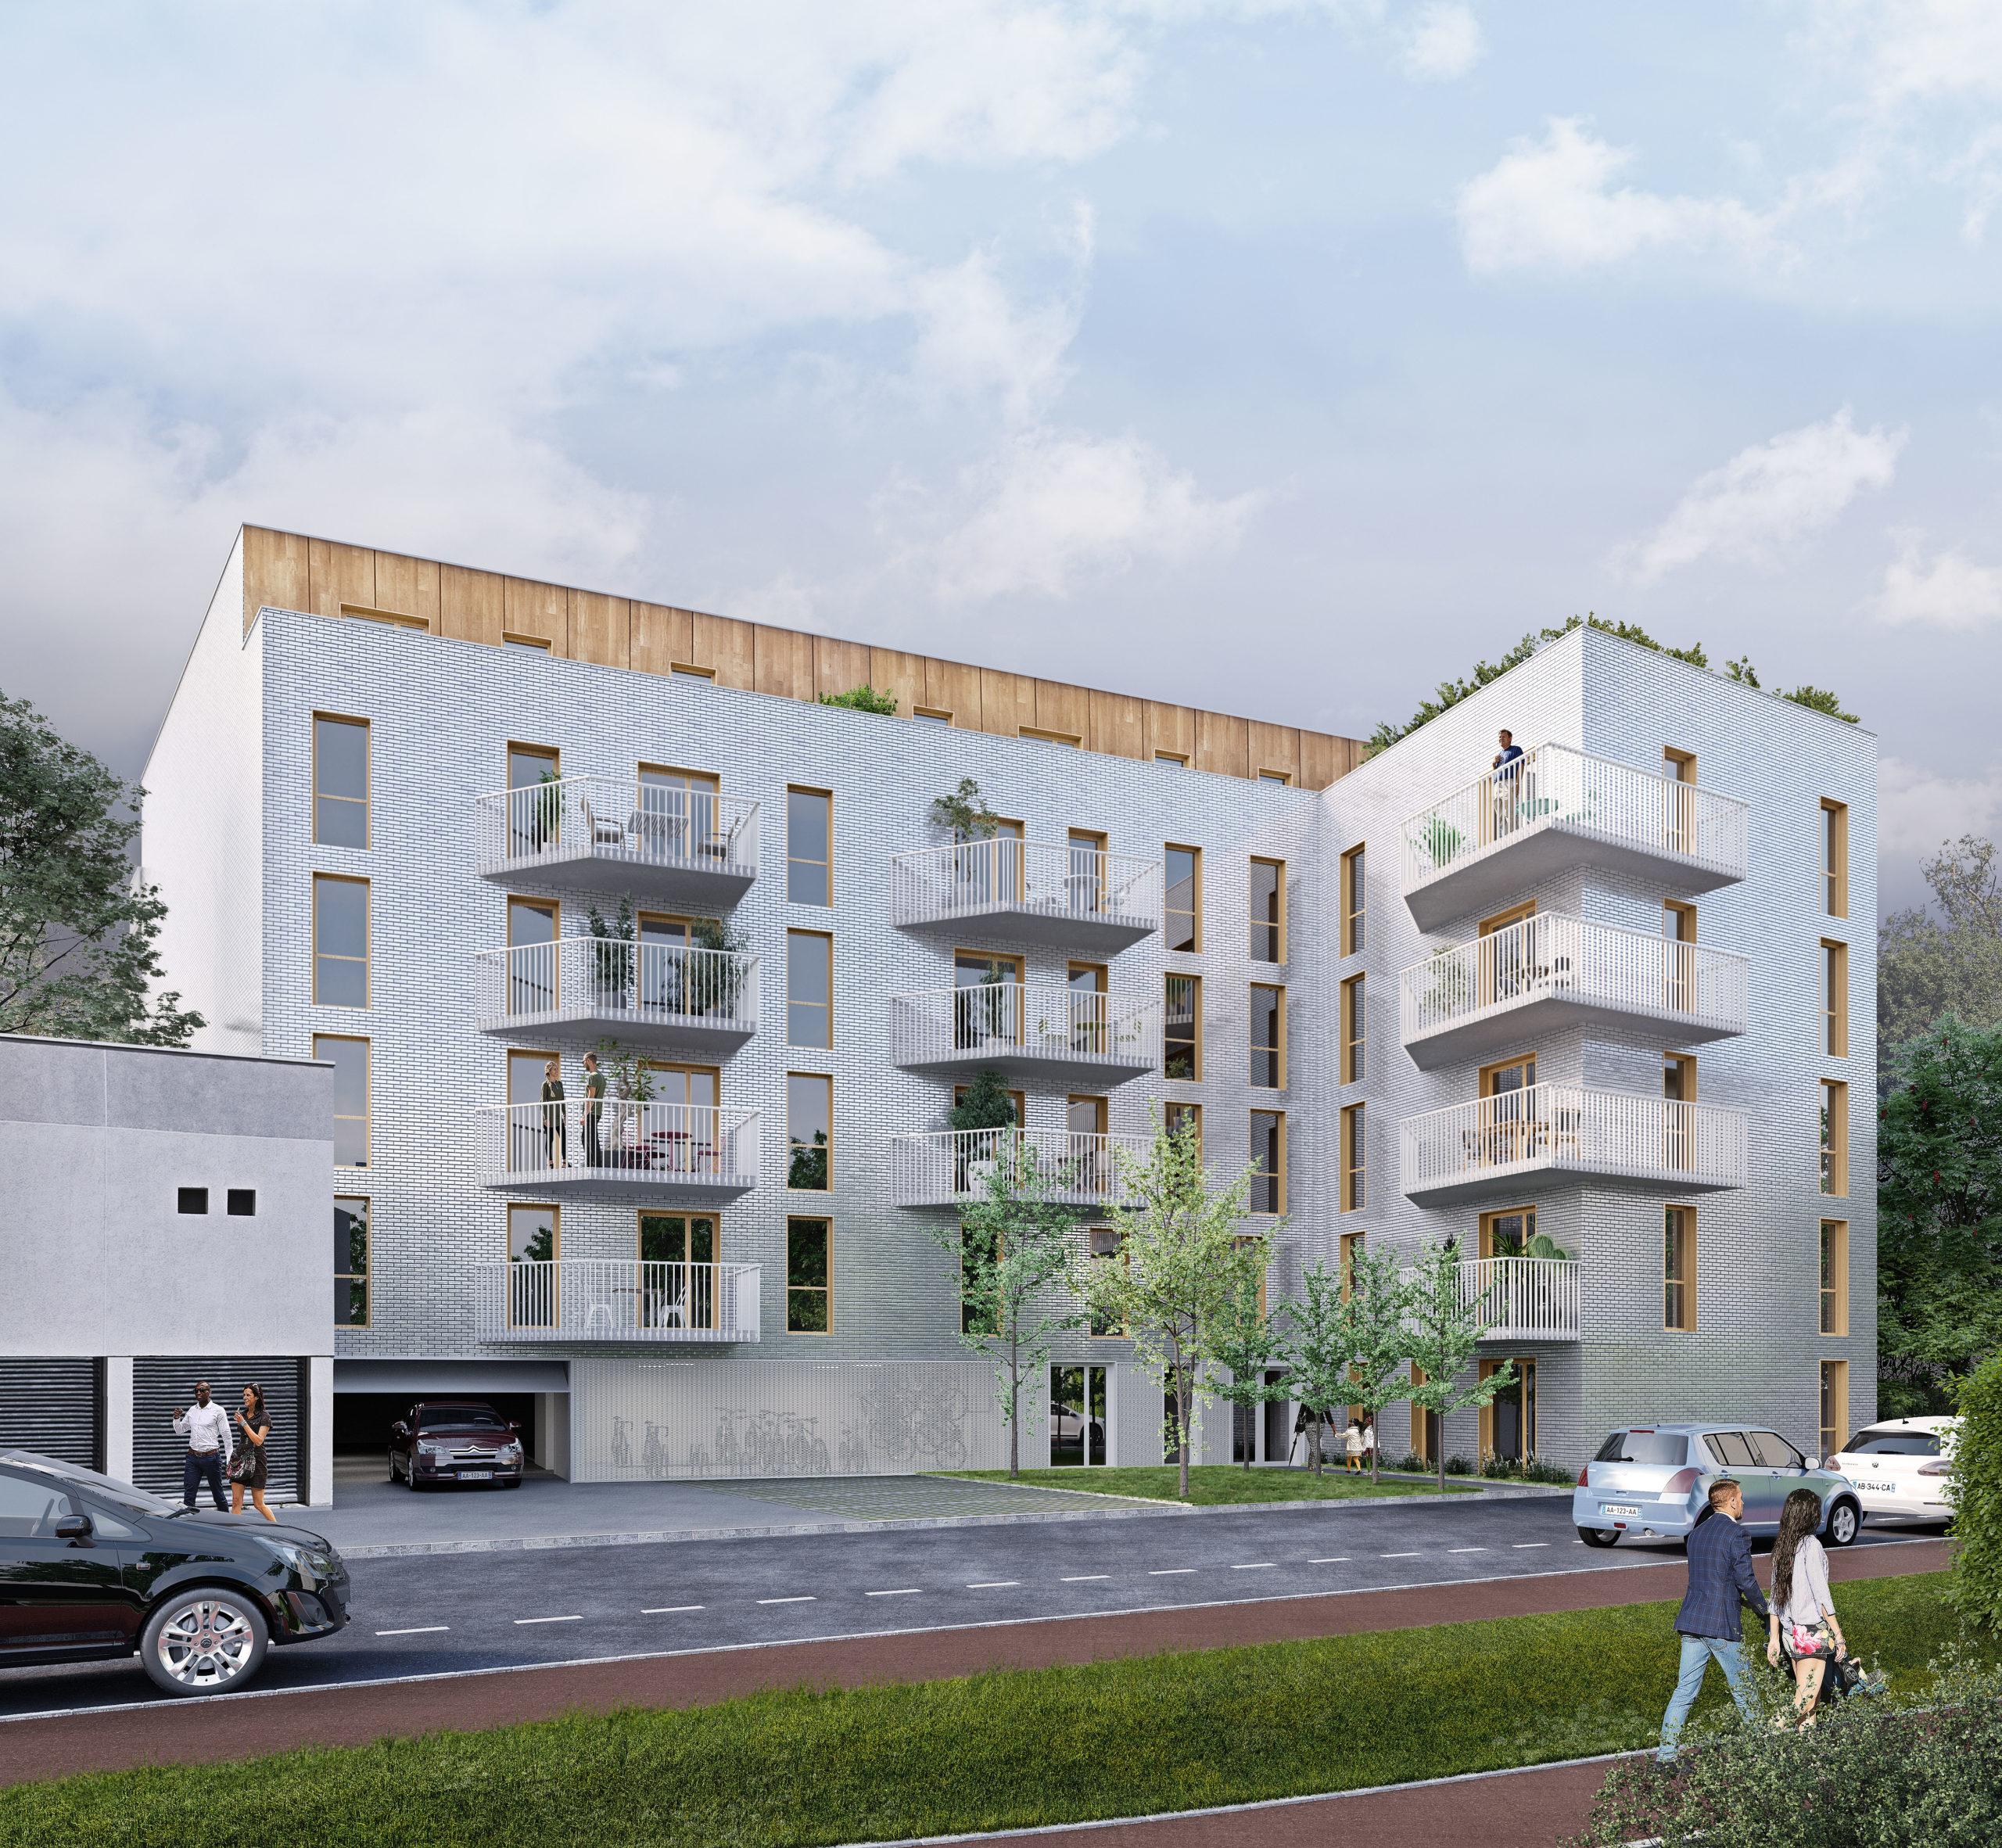 RAMERY-IMMOBILIER-SAINT-GERMAIN-EN-LAYE-rue-v03-scaled.jpg